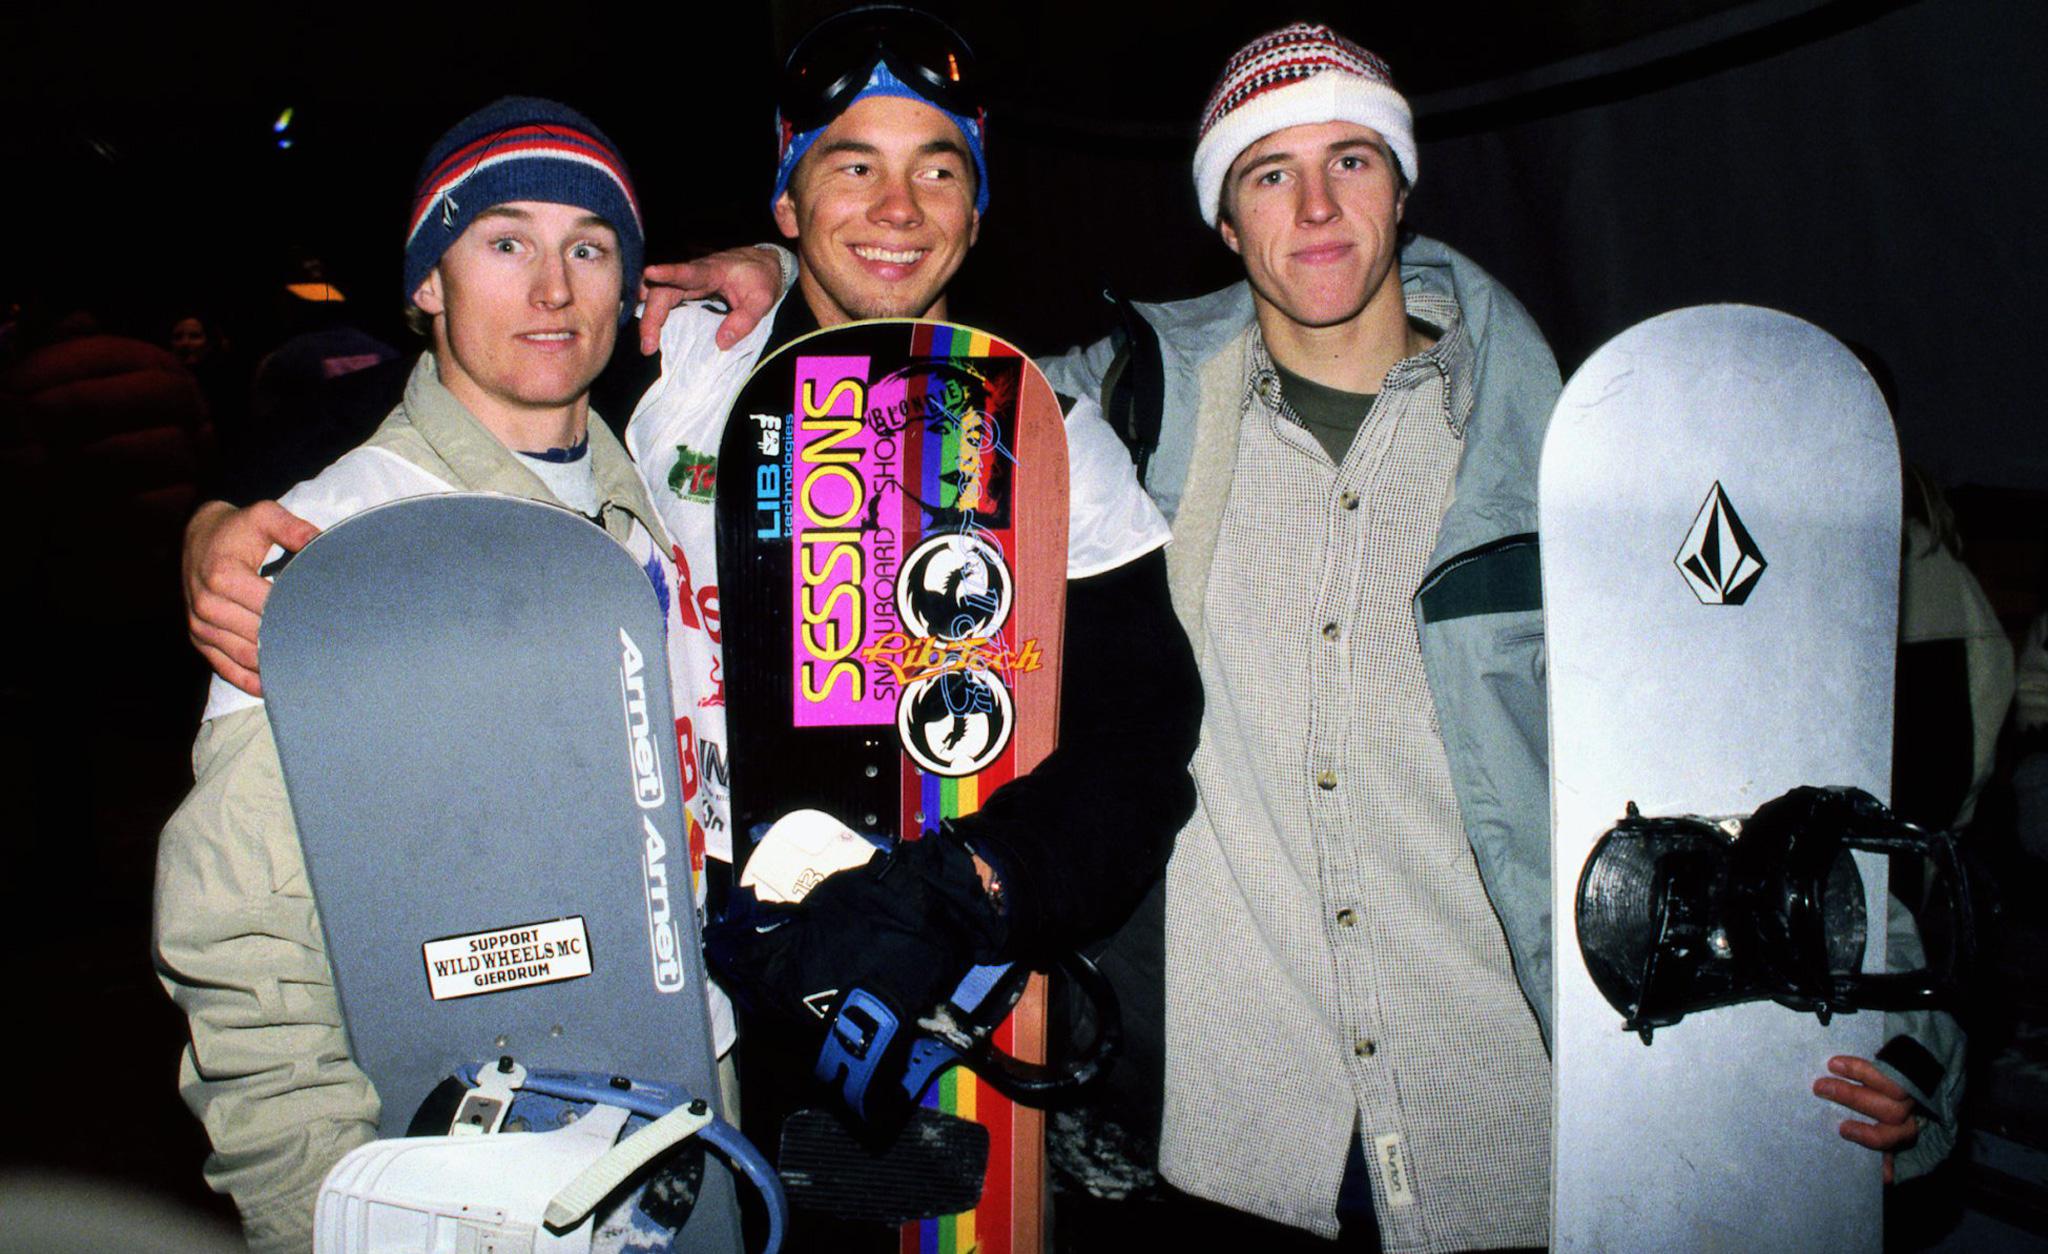 December 1995, Innsbruckbr Winner: Terje Hkonsen